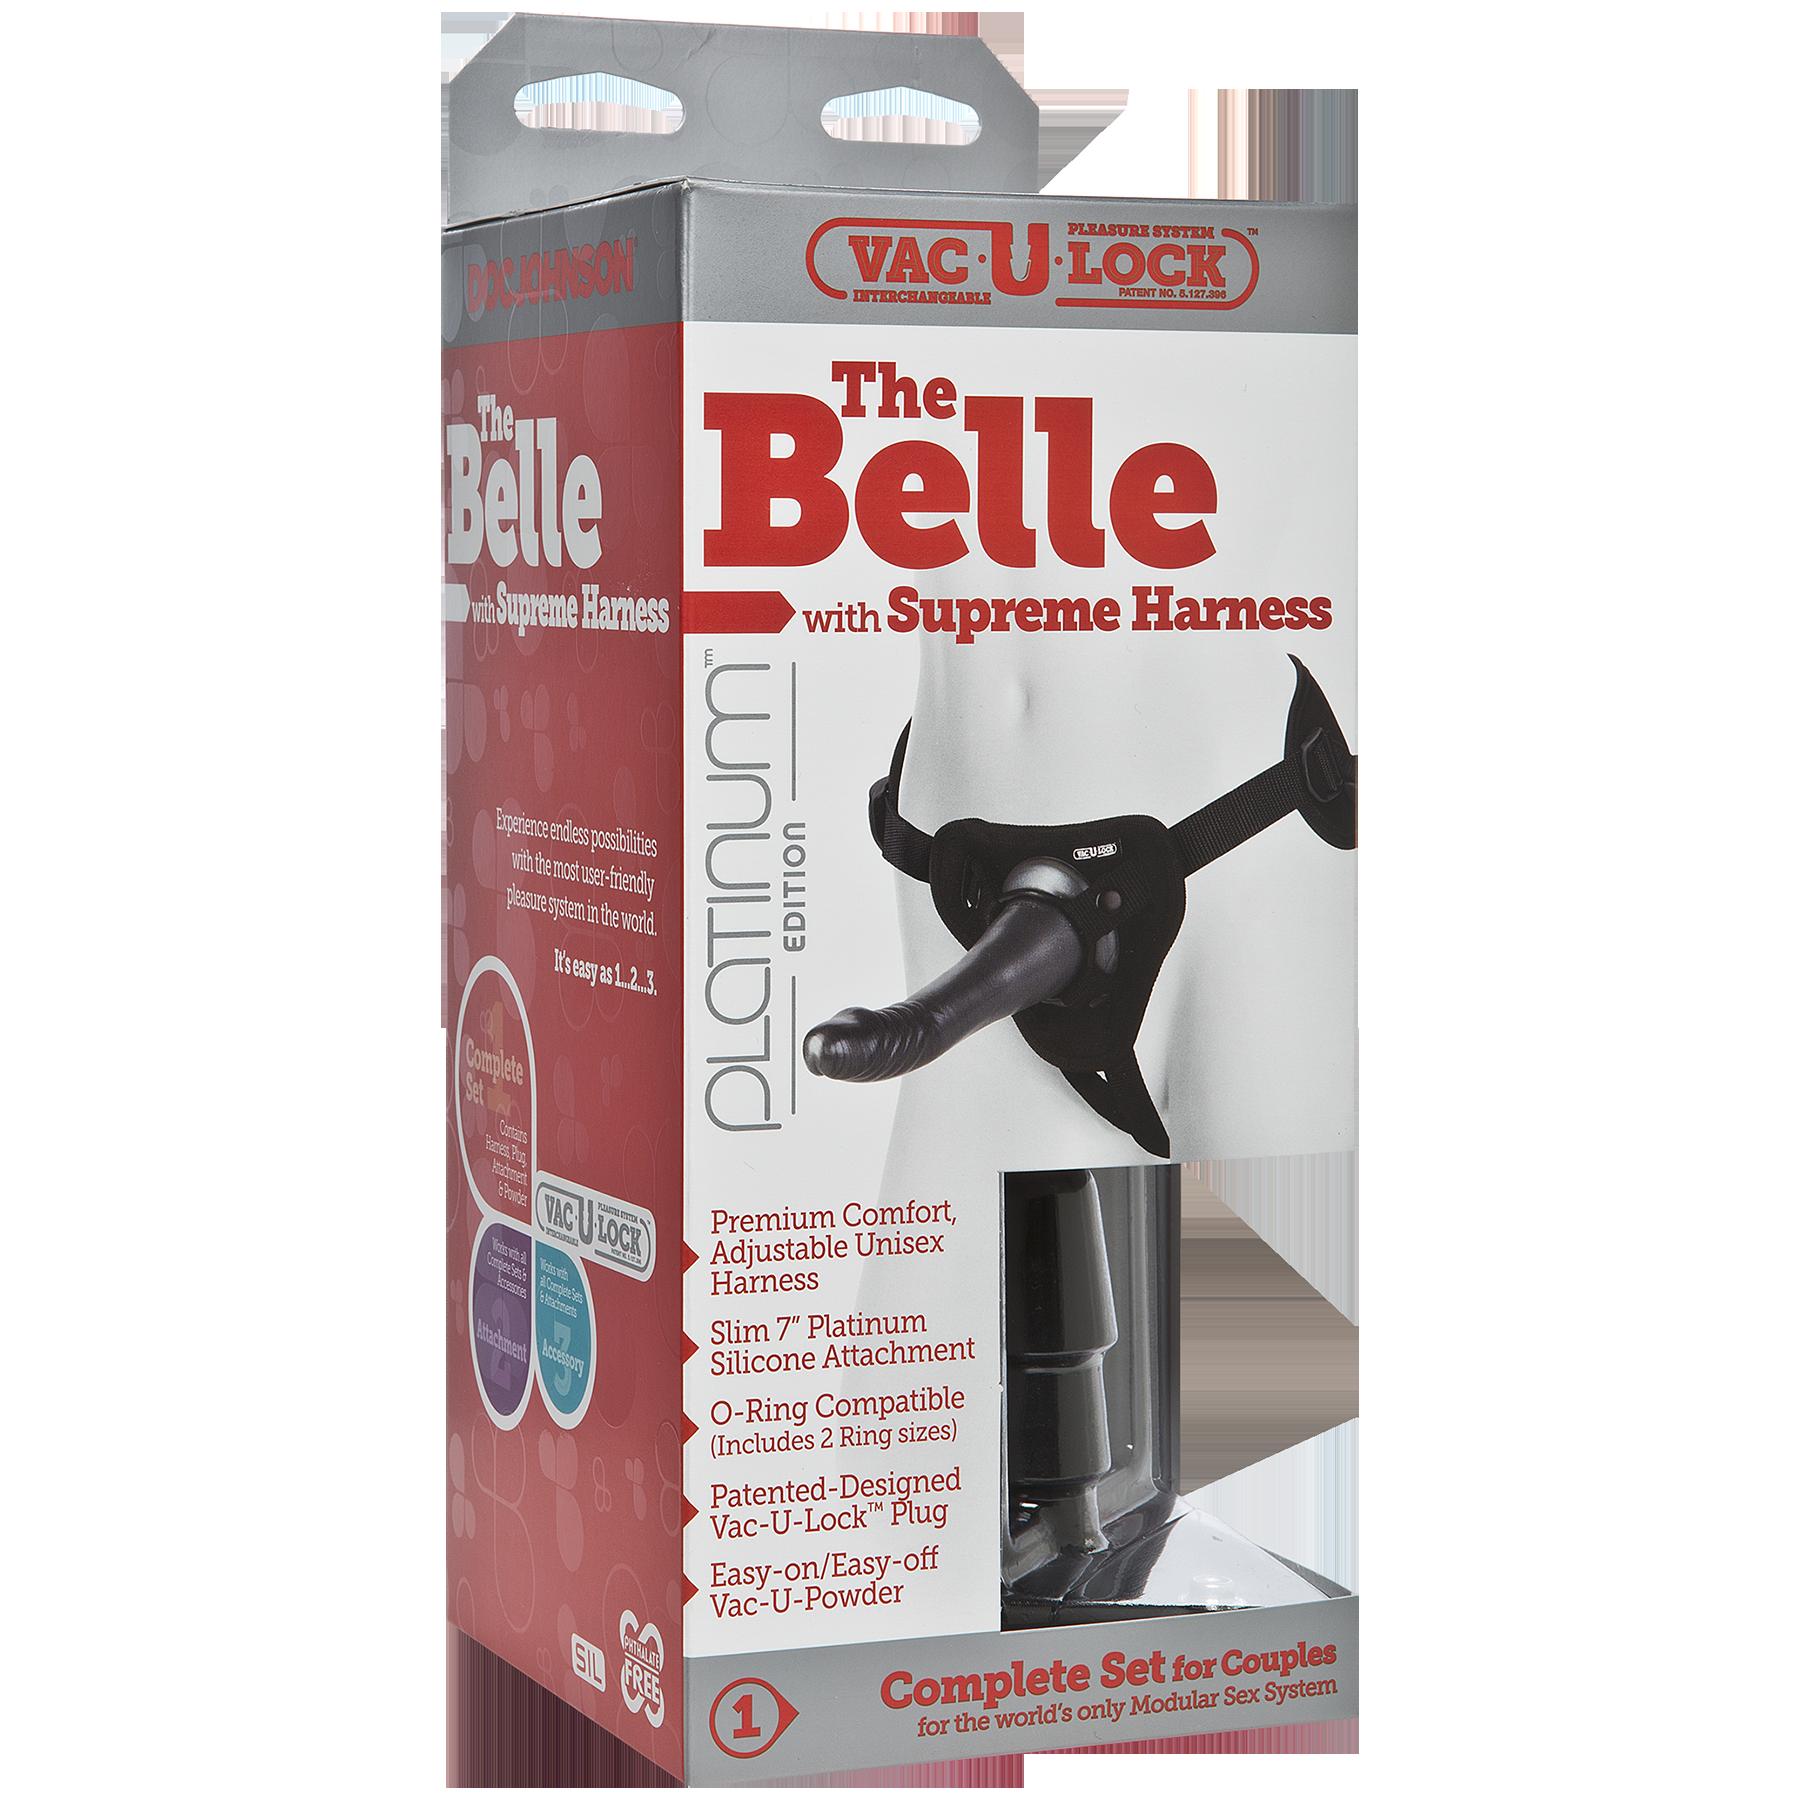 Doc Johnson: Vac-U-Lock™ Platinum Edition - The Belle with Supreme